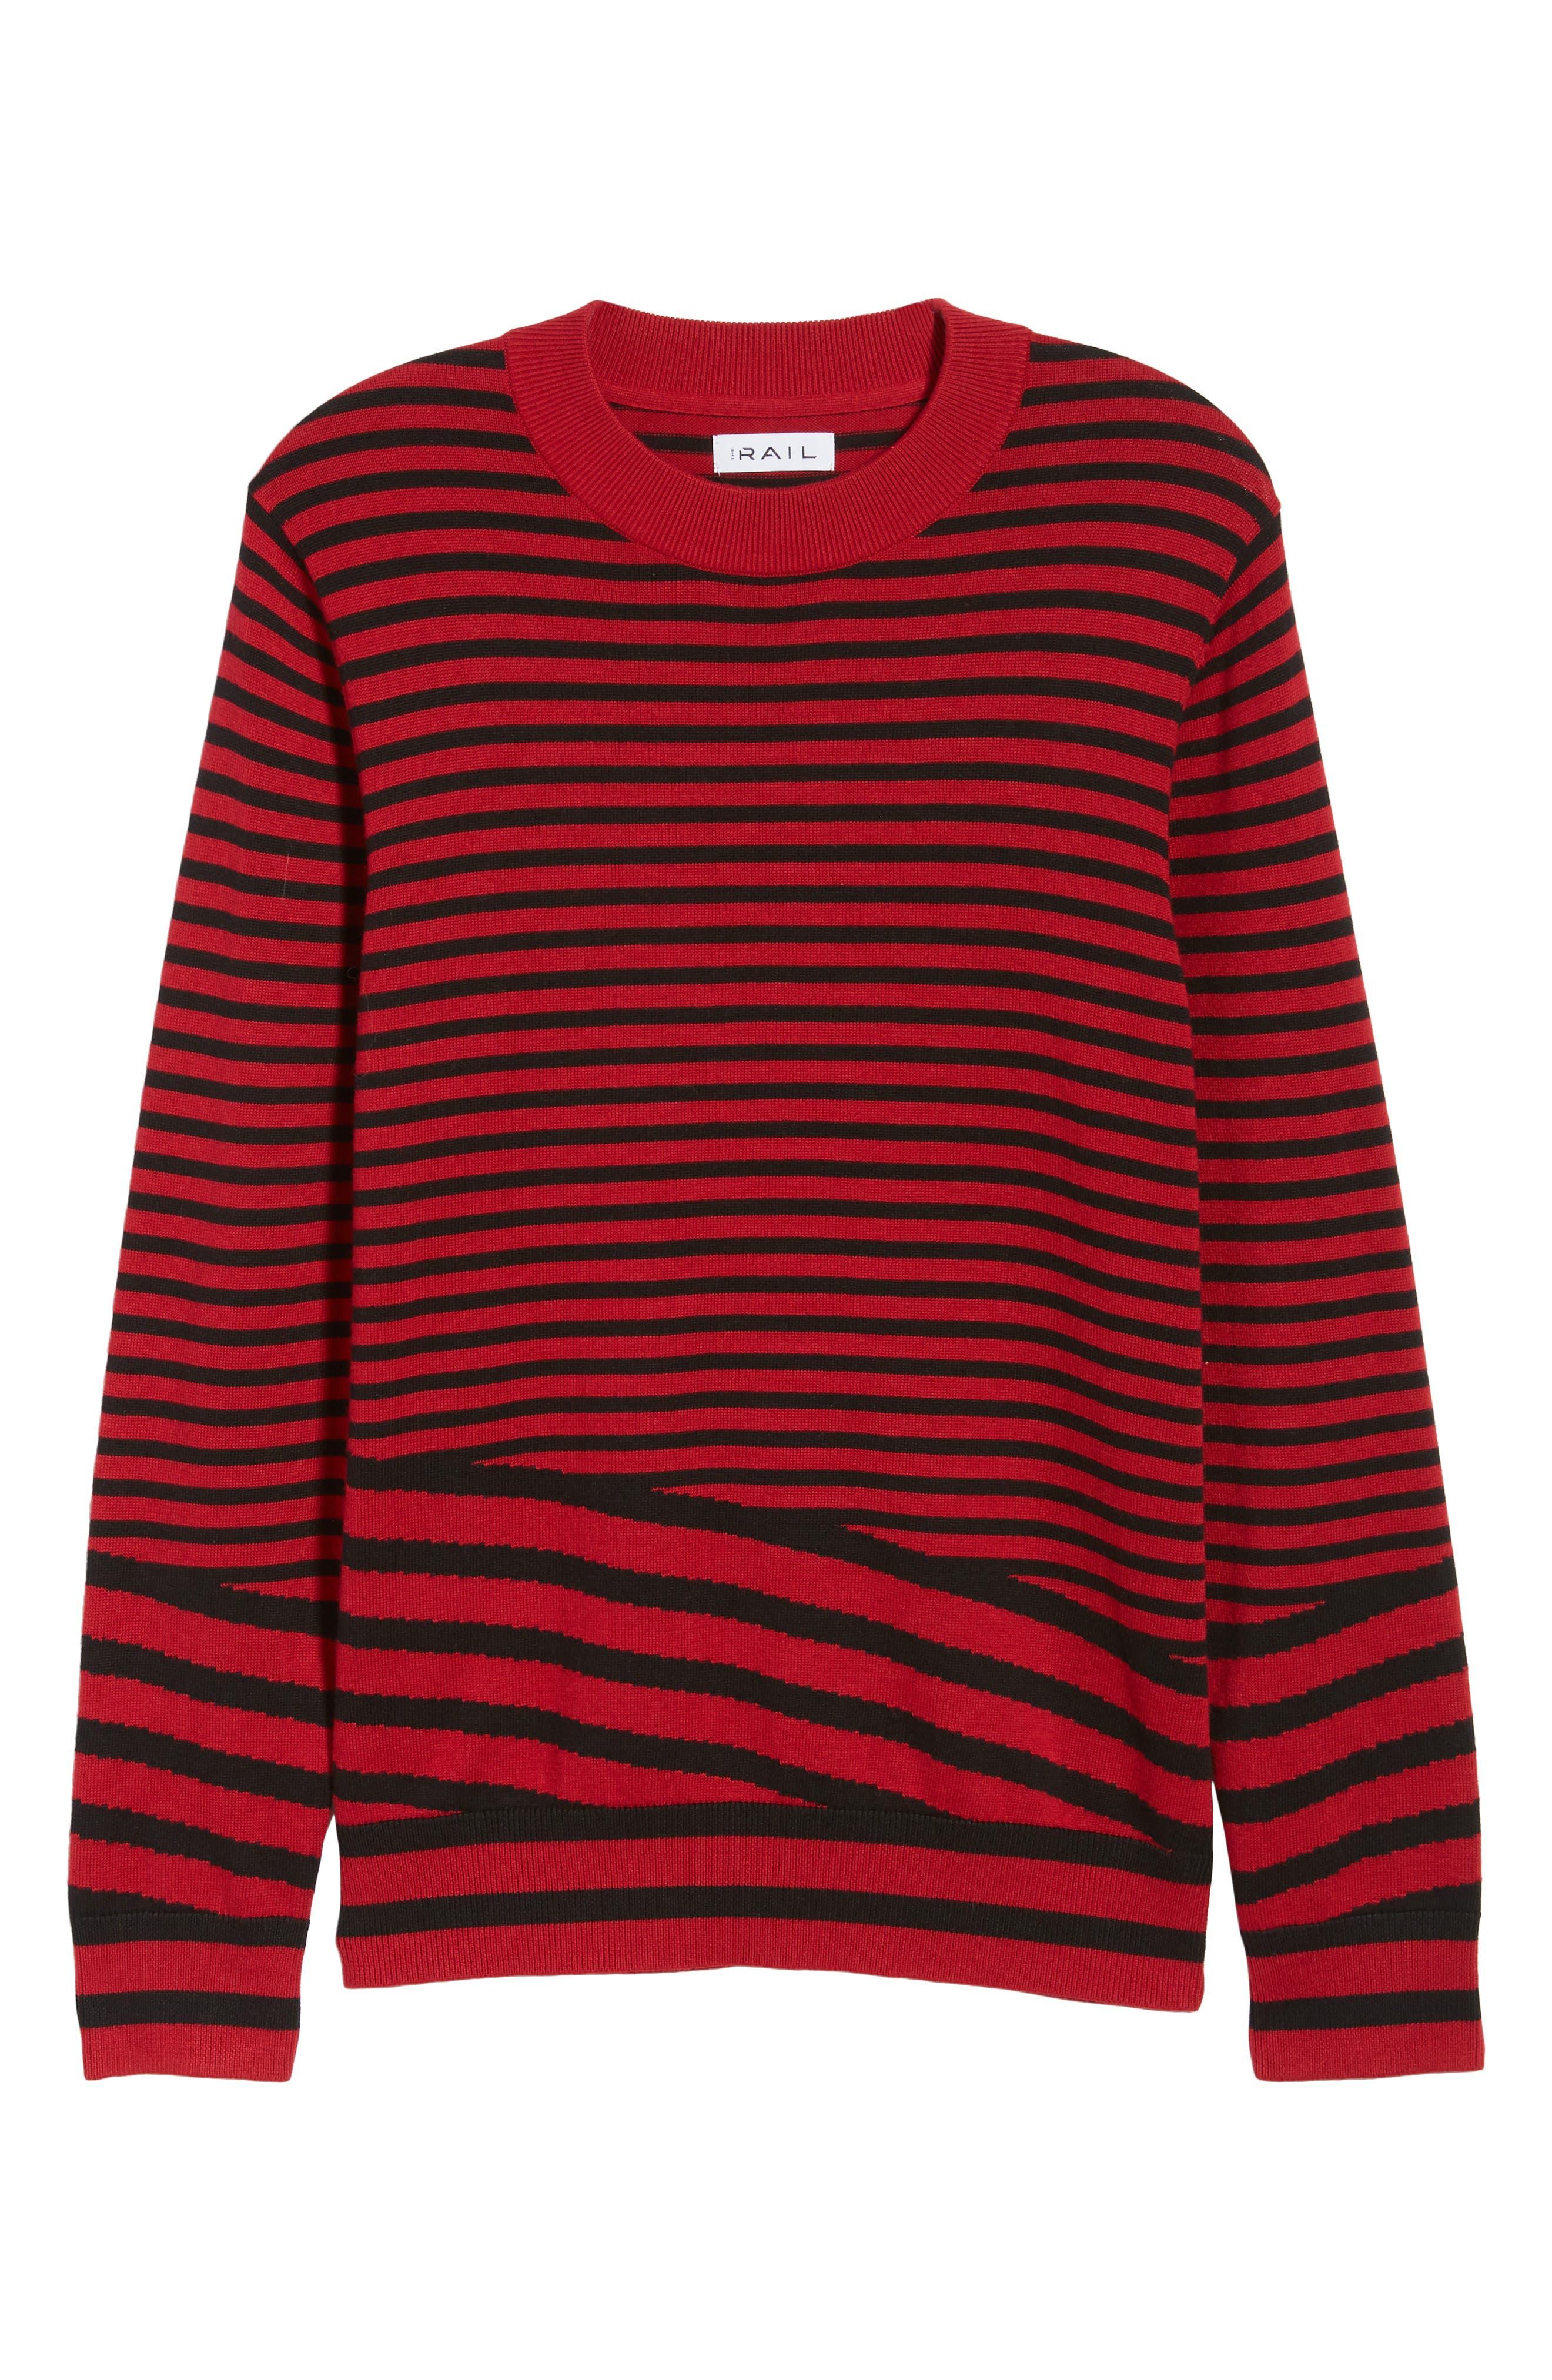 Asymmetrical Stripe Longline Sweater,                             Alternate thumbnail 6, color,                             RED BLACK RETRO STRIPE